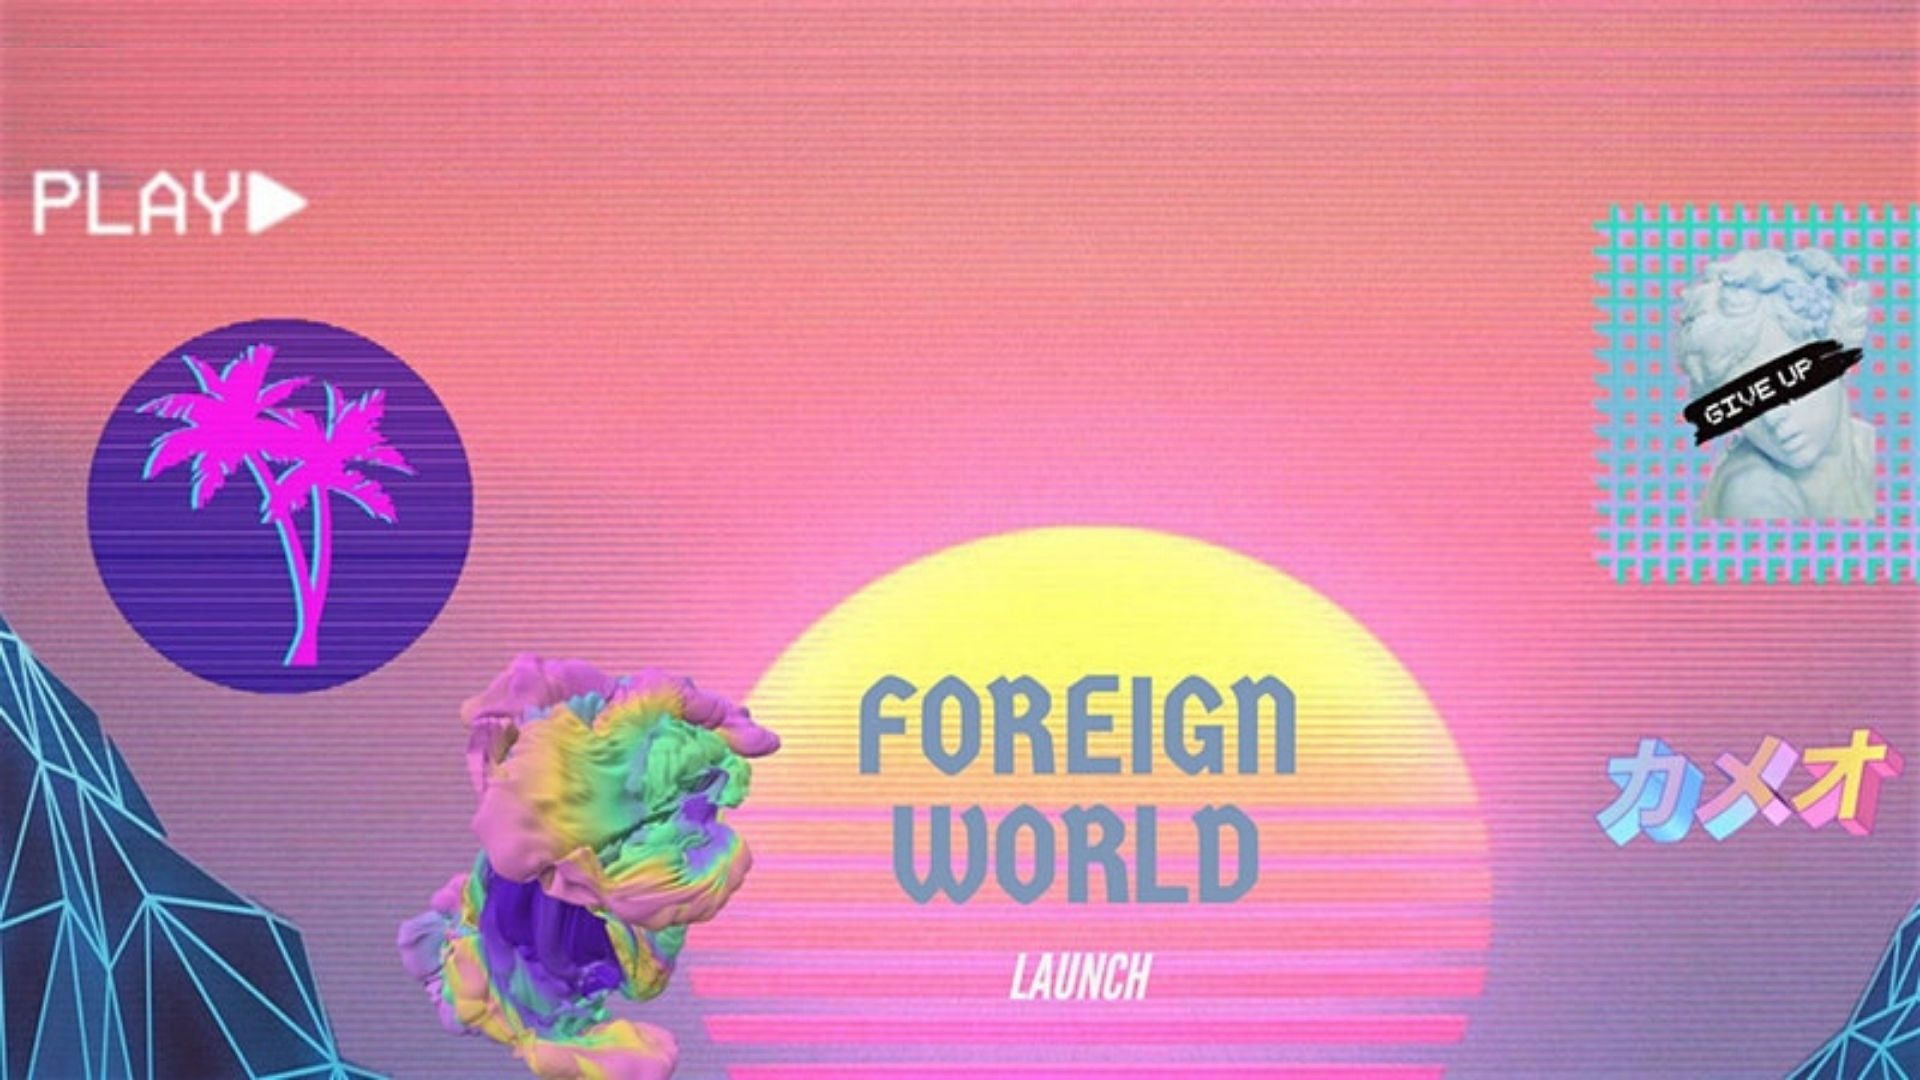 Foreign World